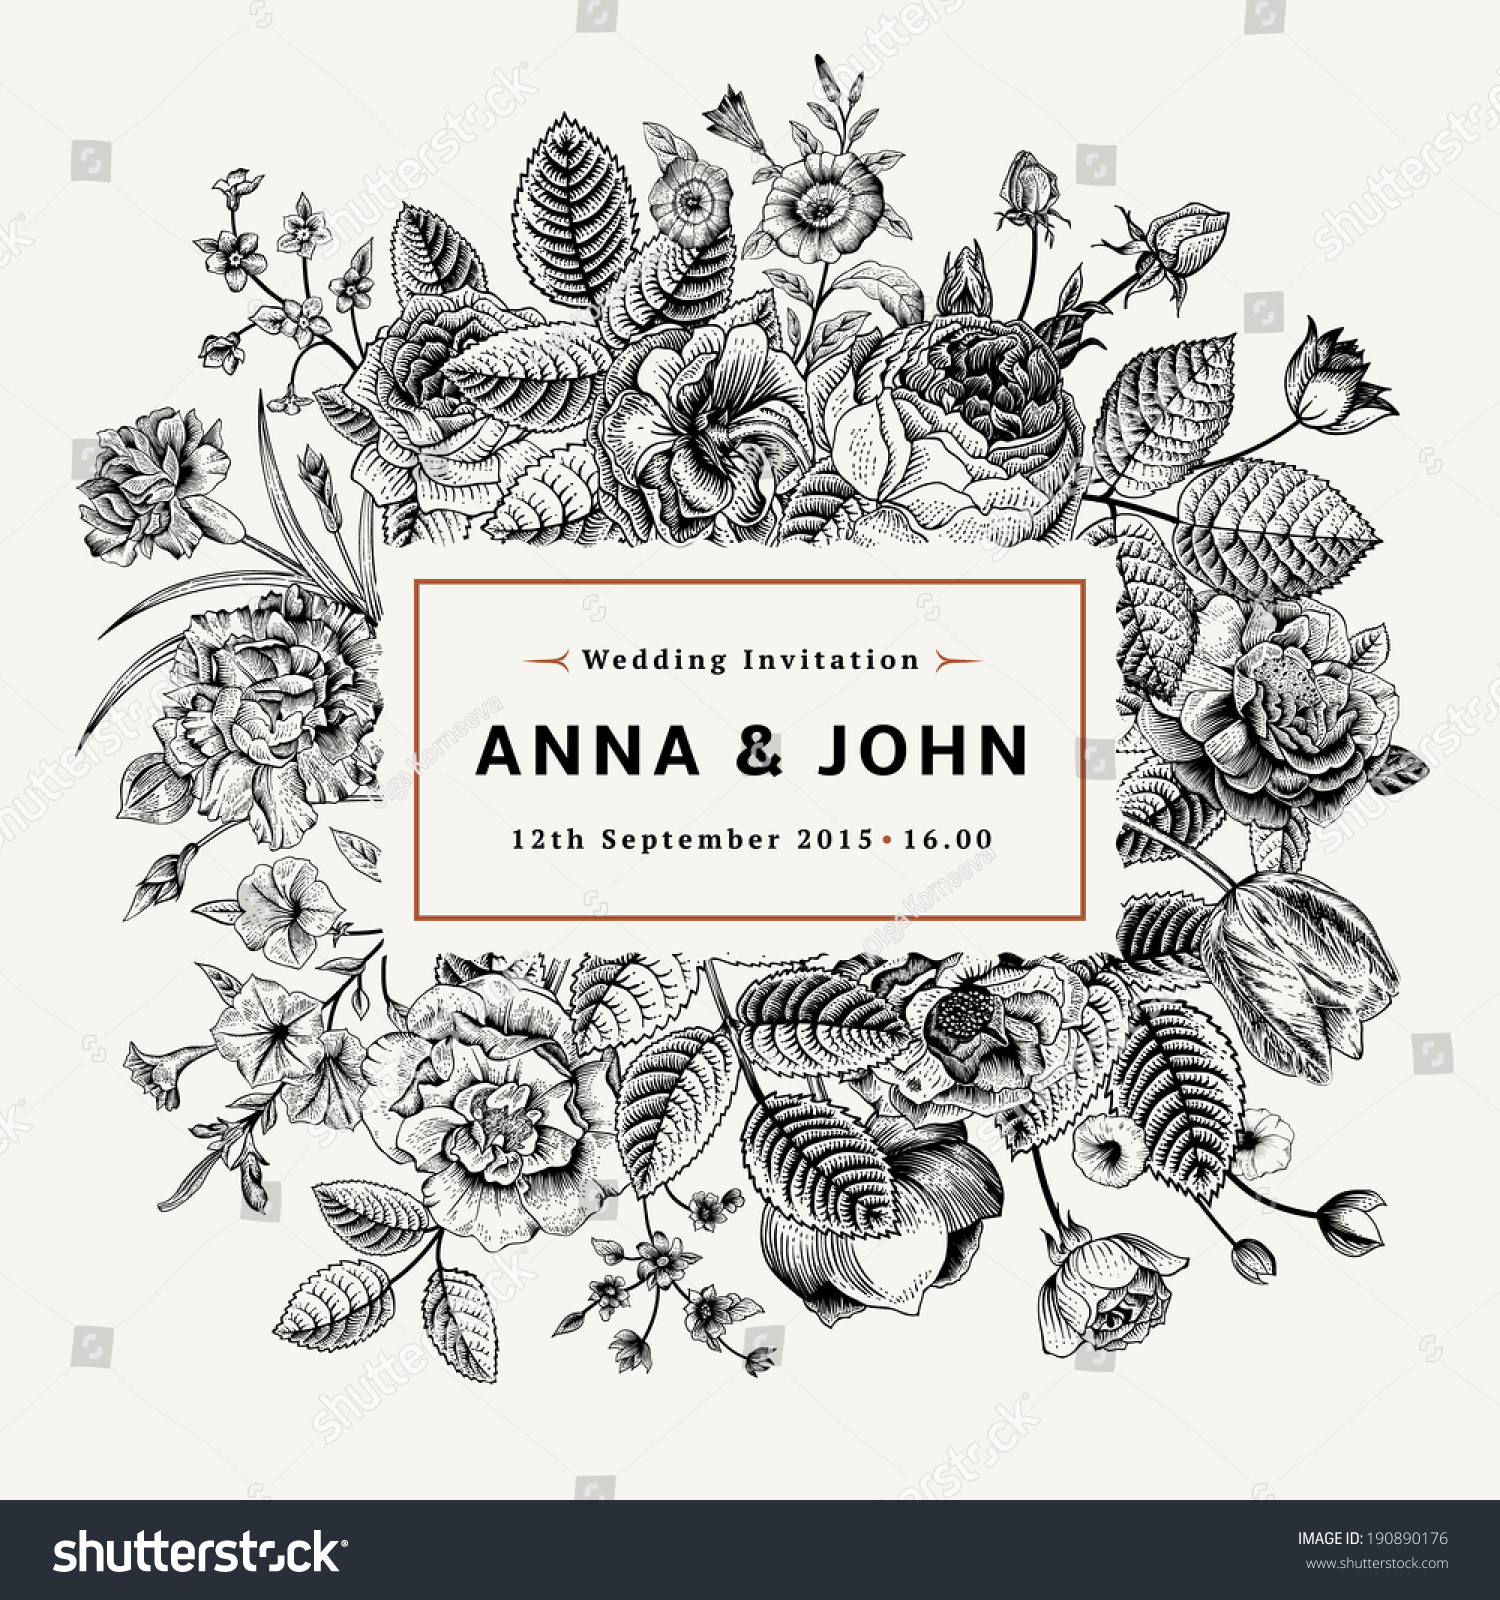 Vintage Elegant Wedding Invitation Summer Flowers Vector – Black and White Vintage Wedding Invitations